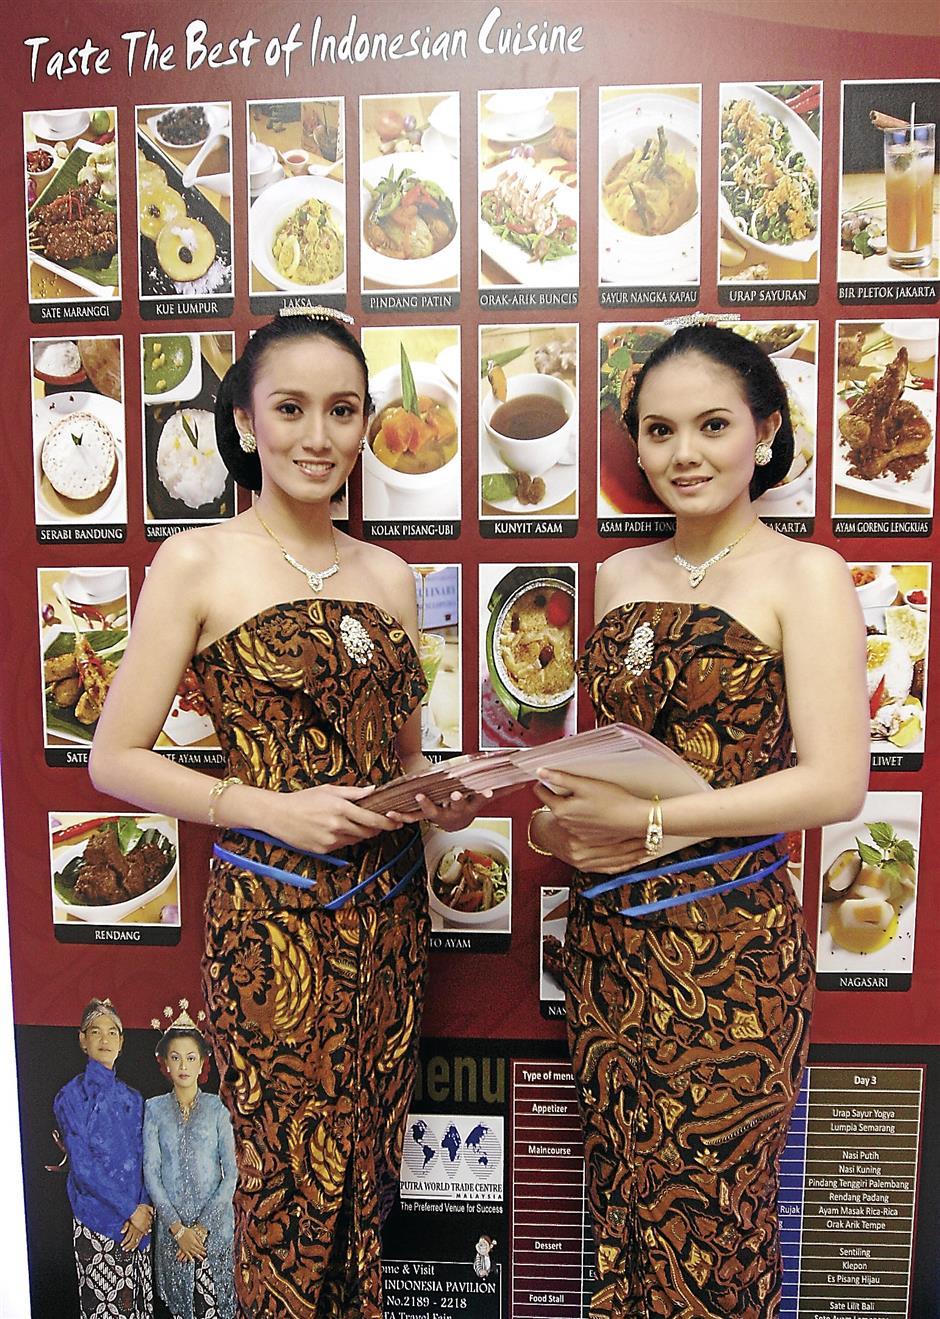 Indonesia Food Promotion - Taste The BEst of Indonesian Cuisine.